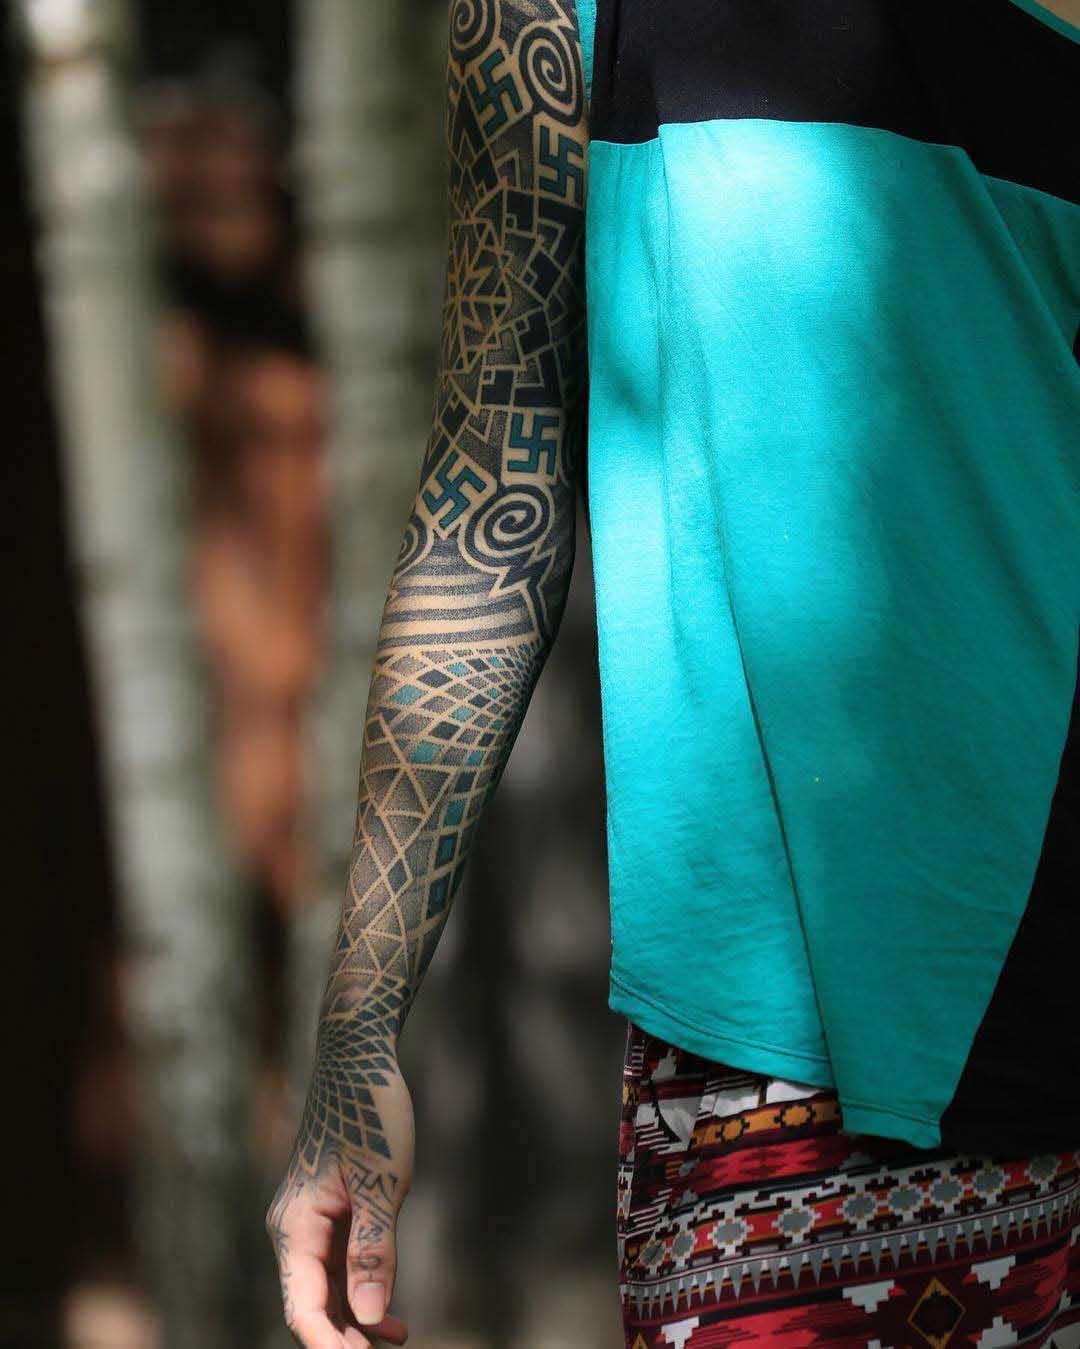 dotwork sleeve tattoo with swastikas